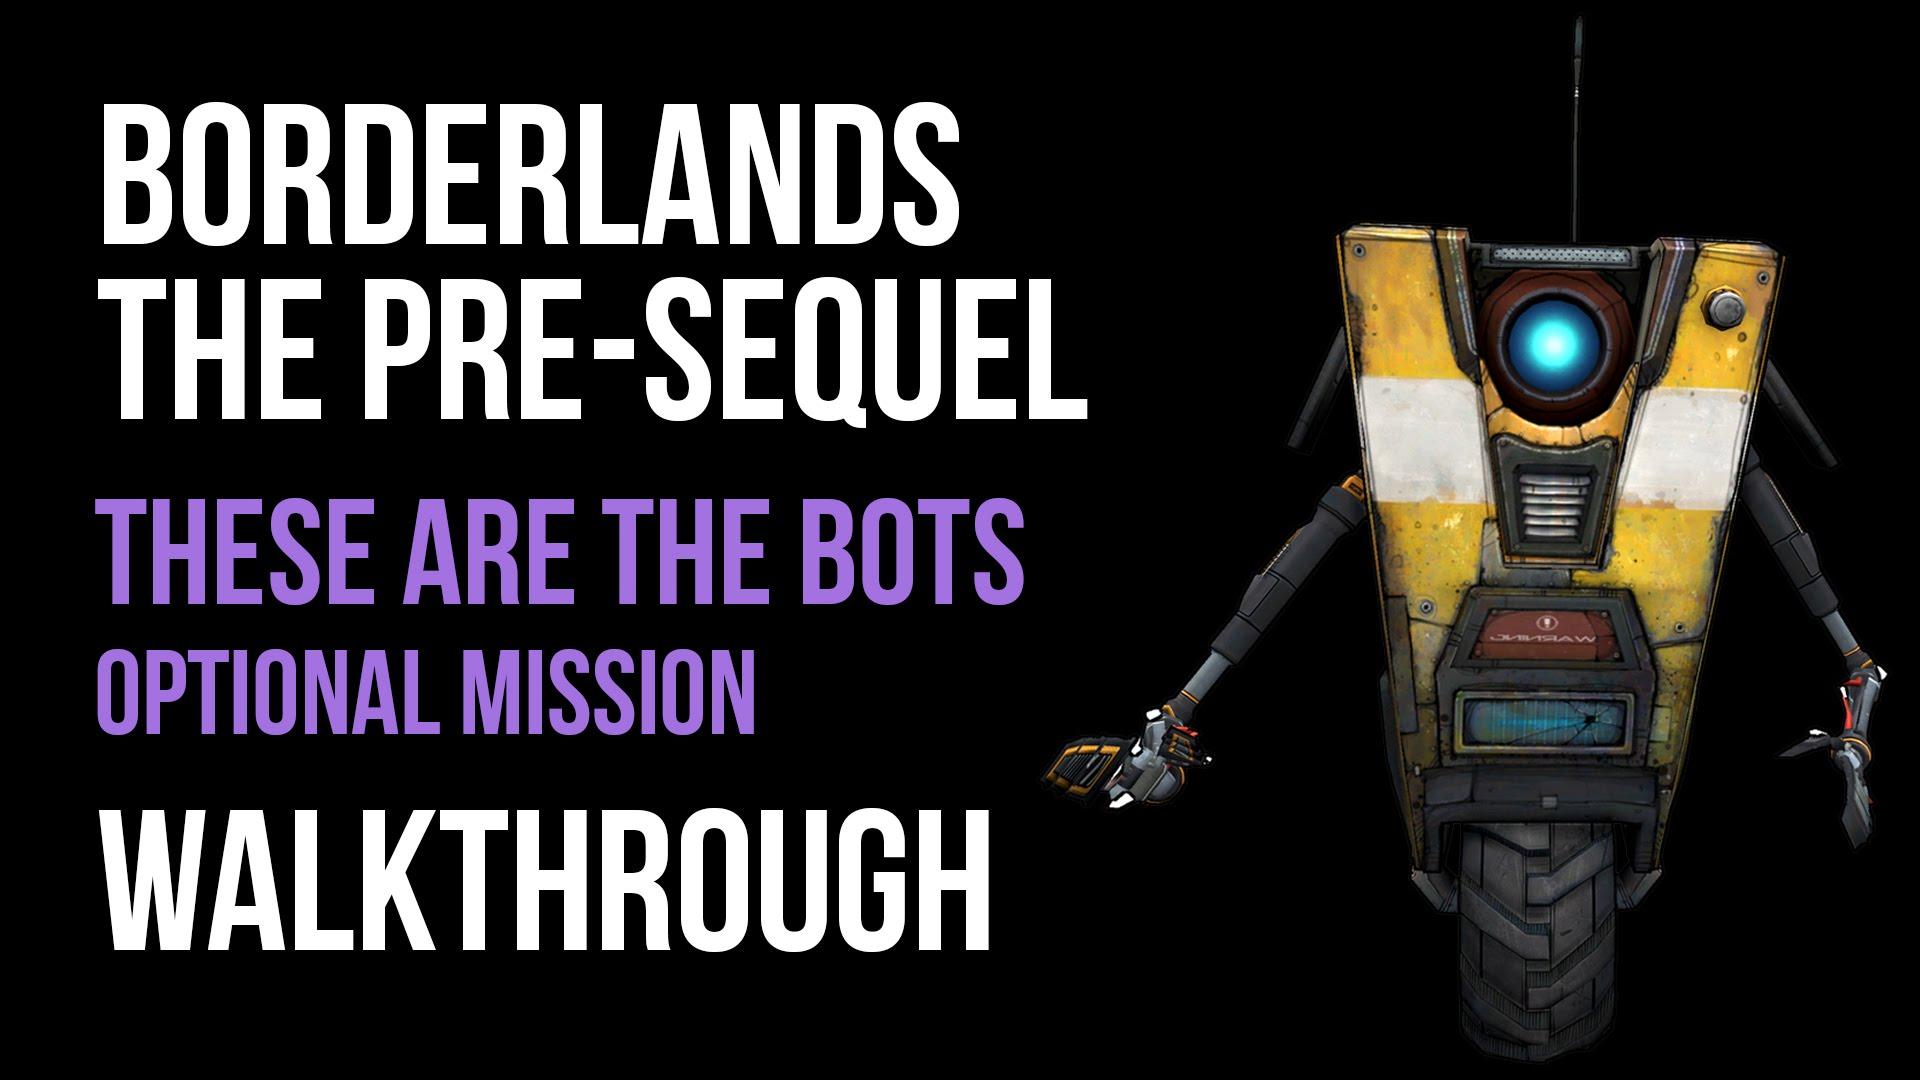 Borderlands the pre sequel these are the bots walkthrough vgfaq